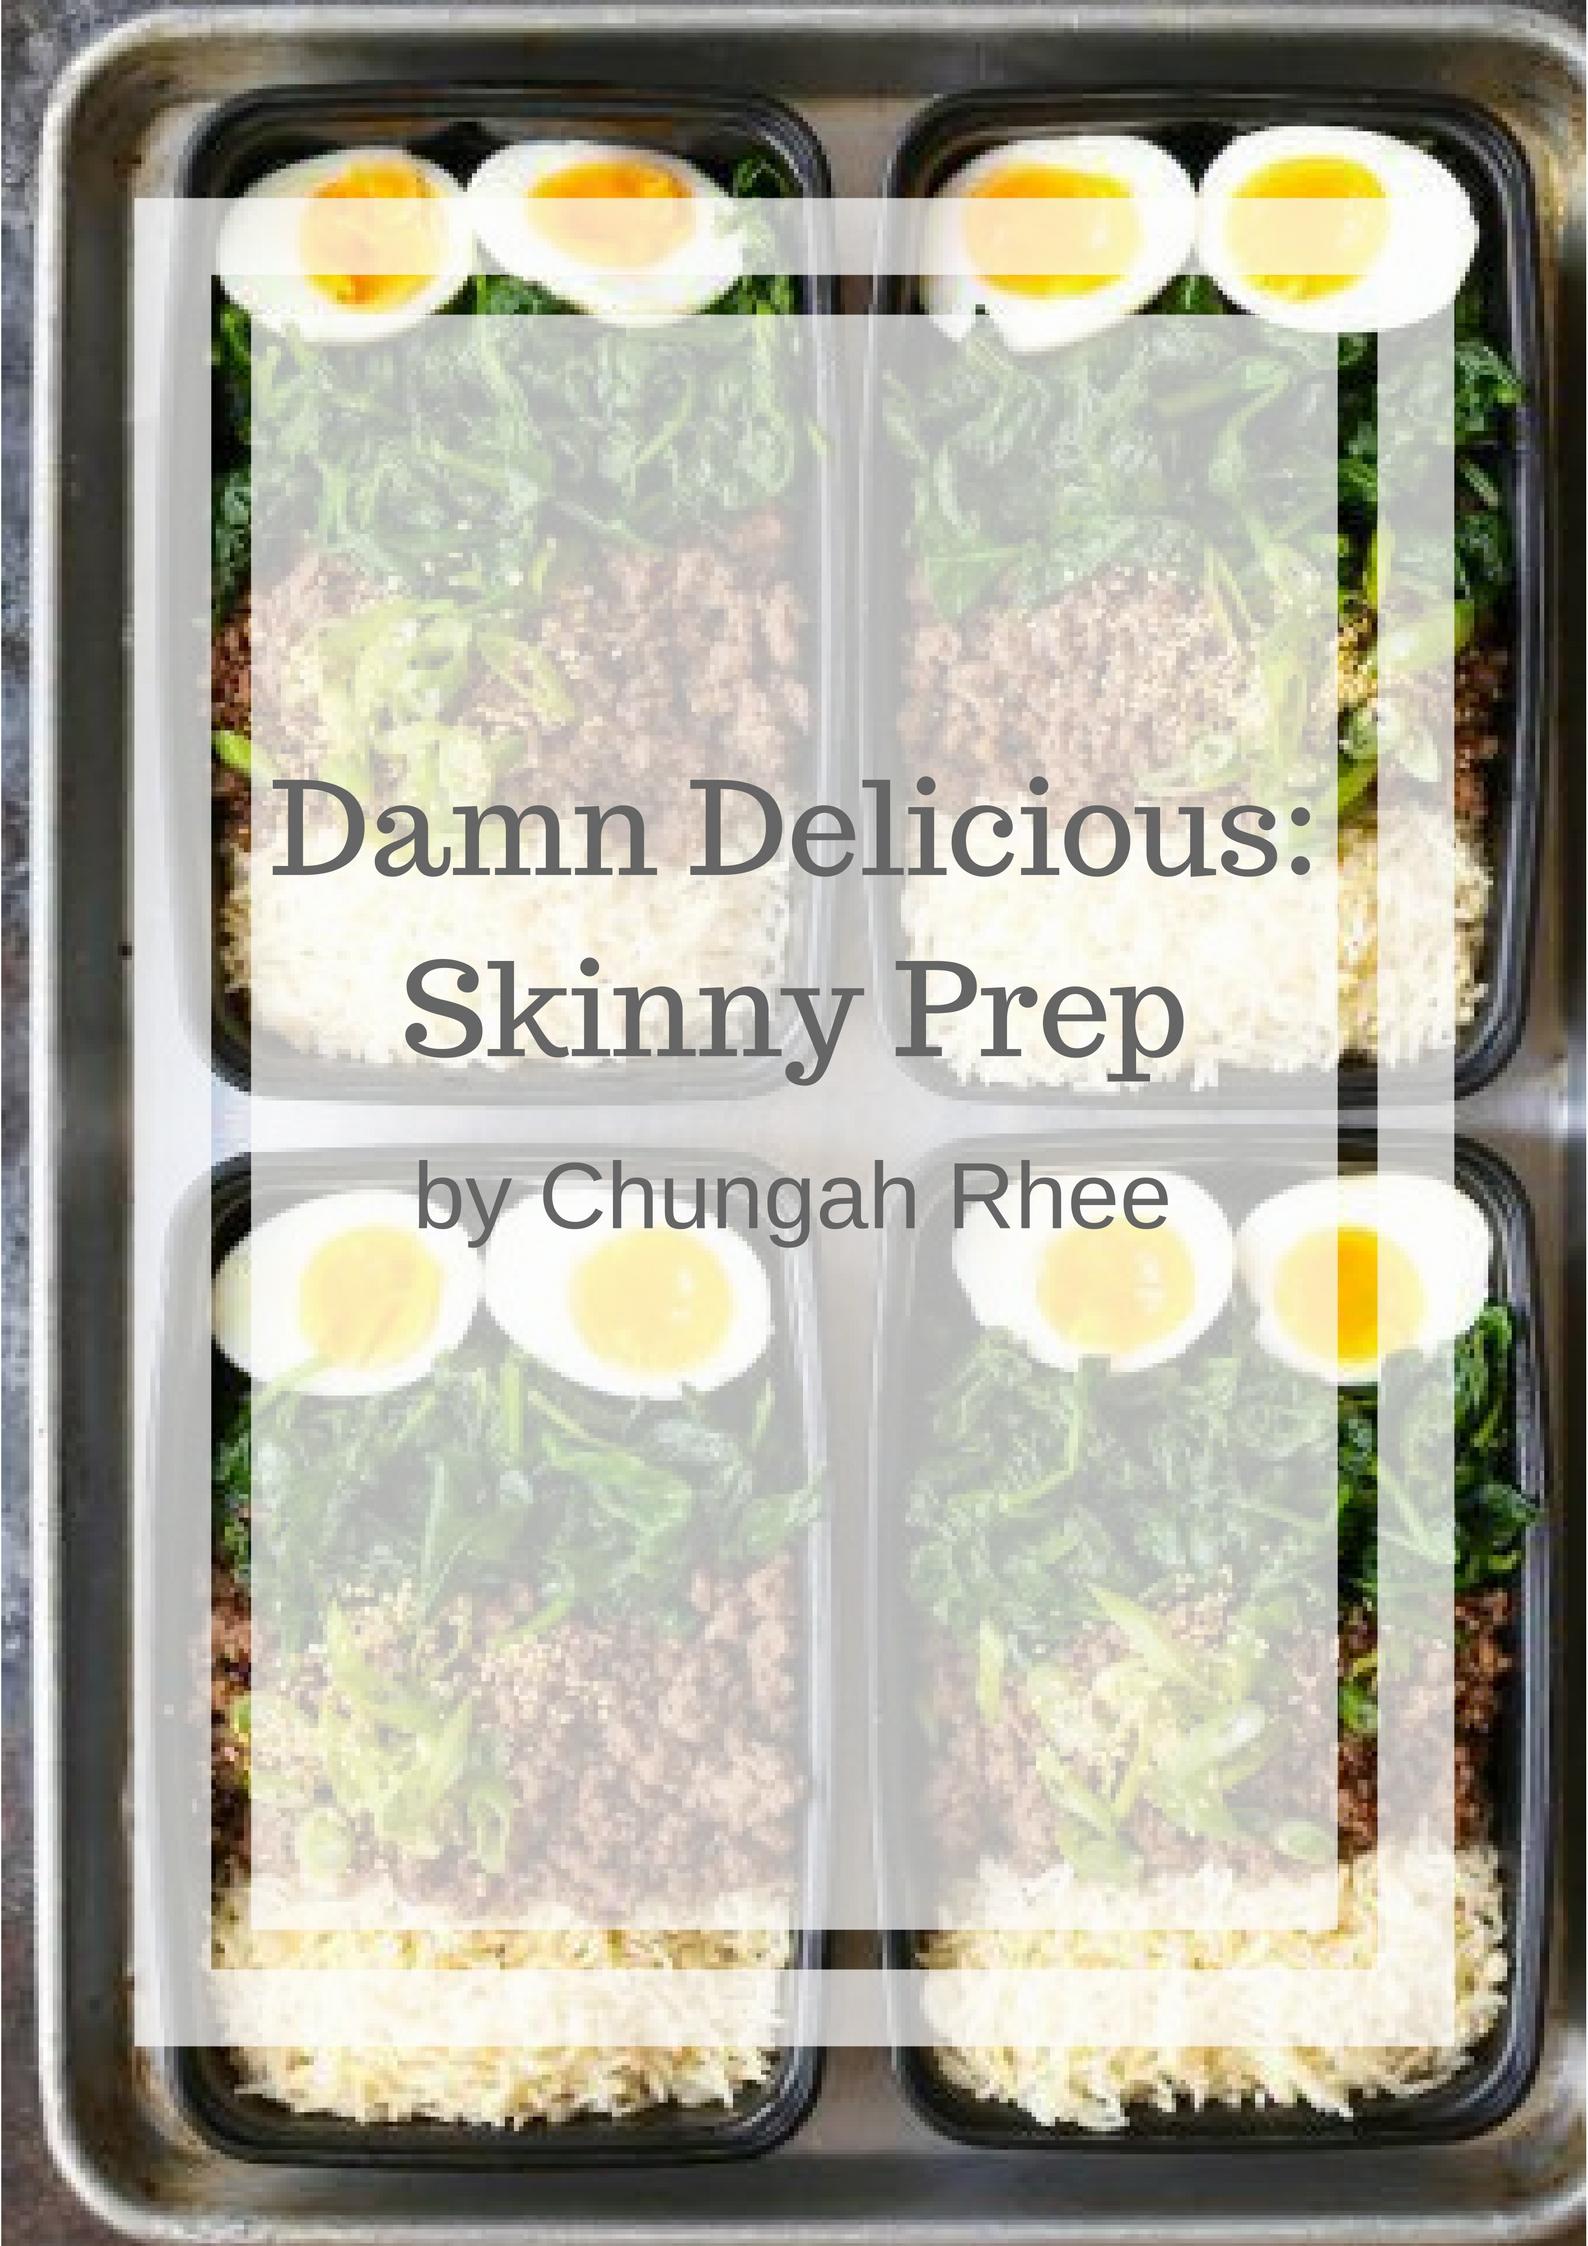 Damn Delicious Skinny Prep Chunghah Rhee cookbook deal